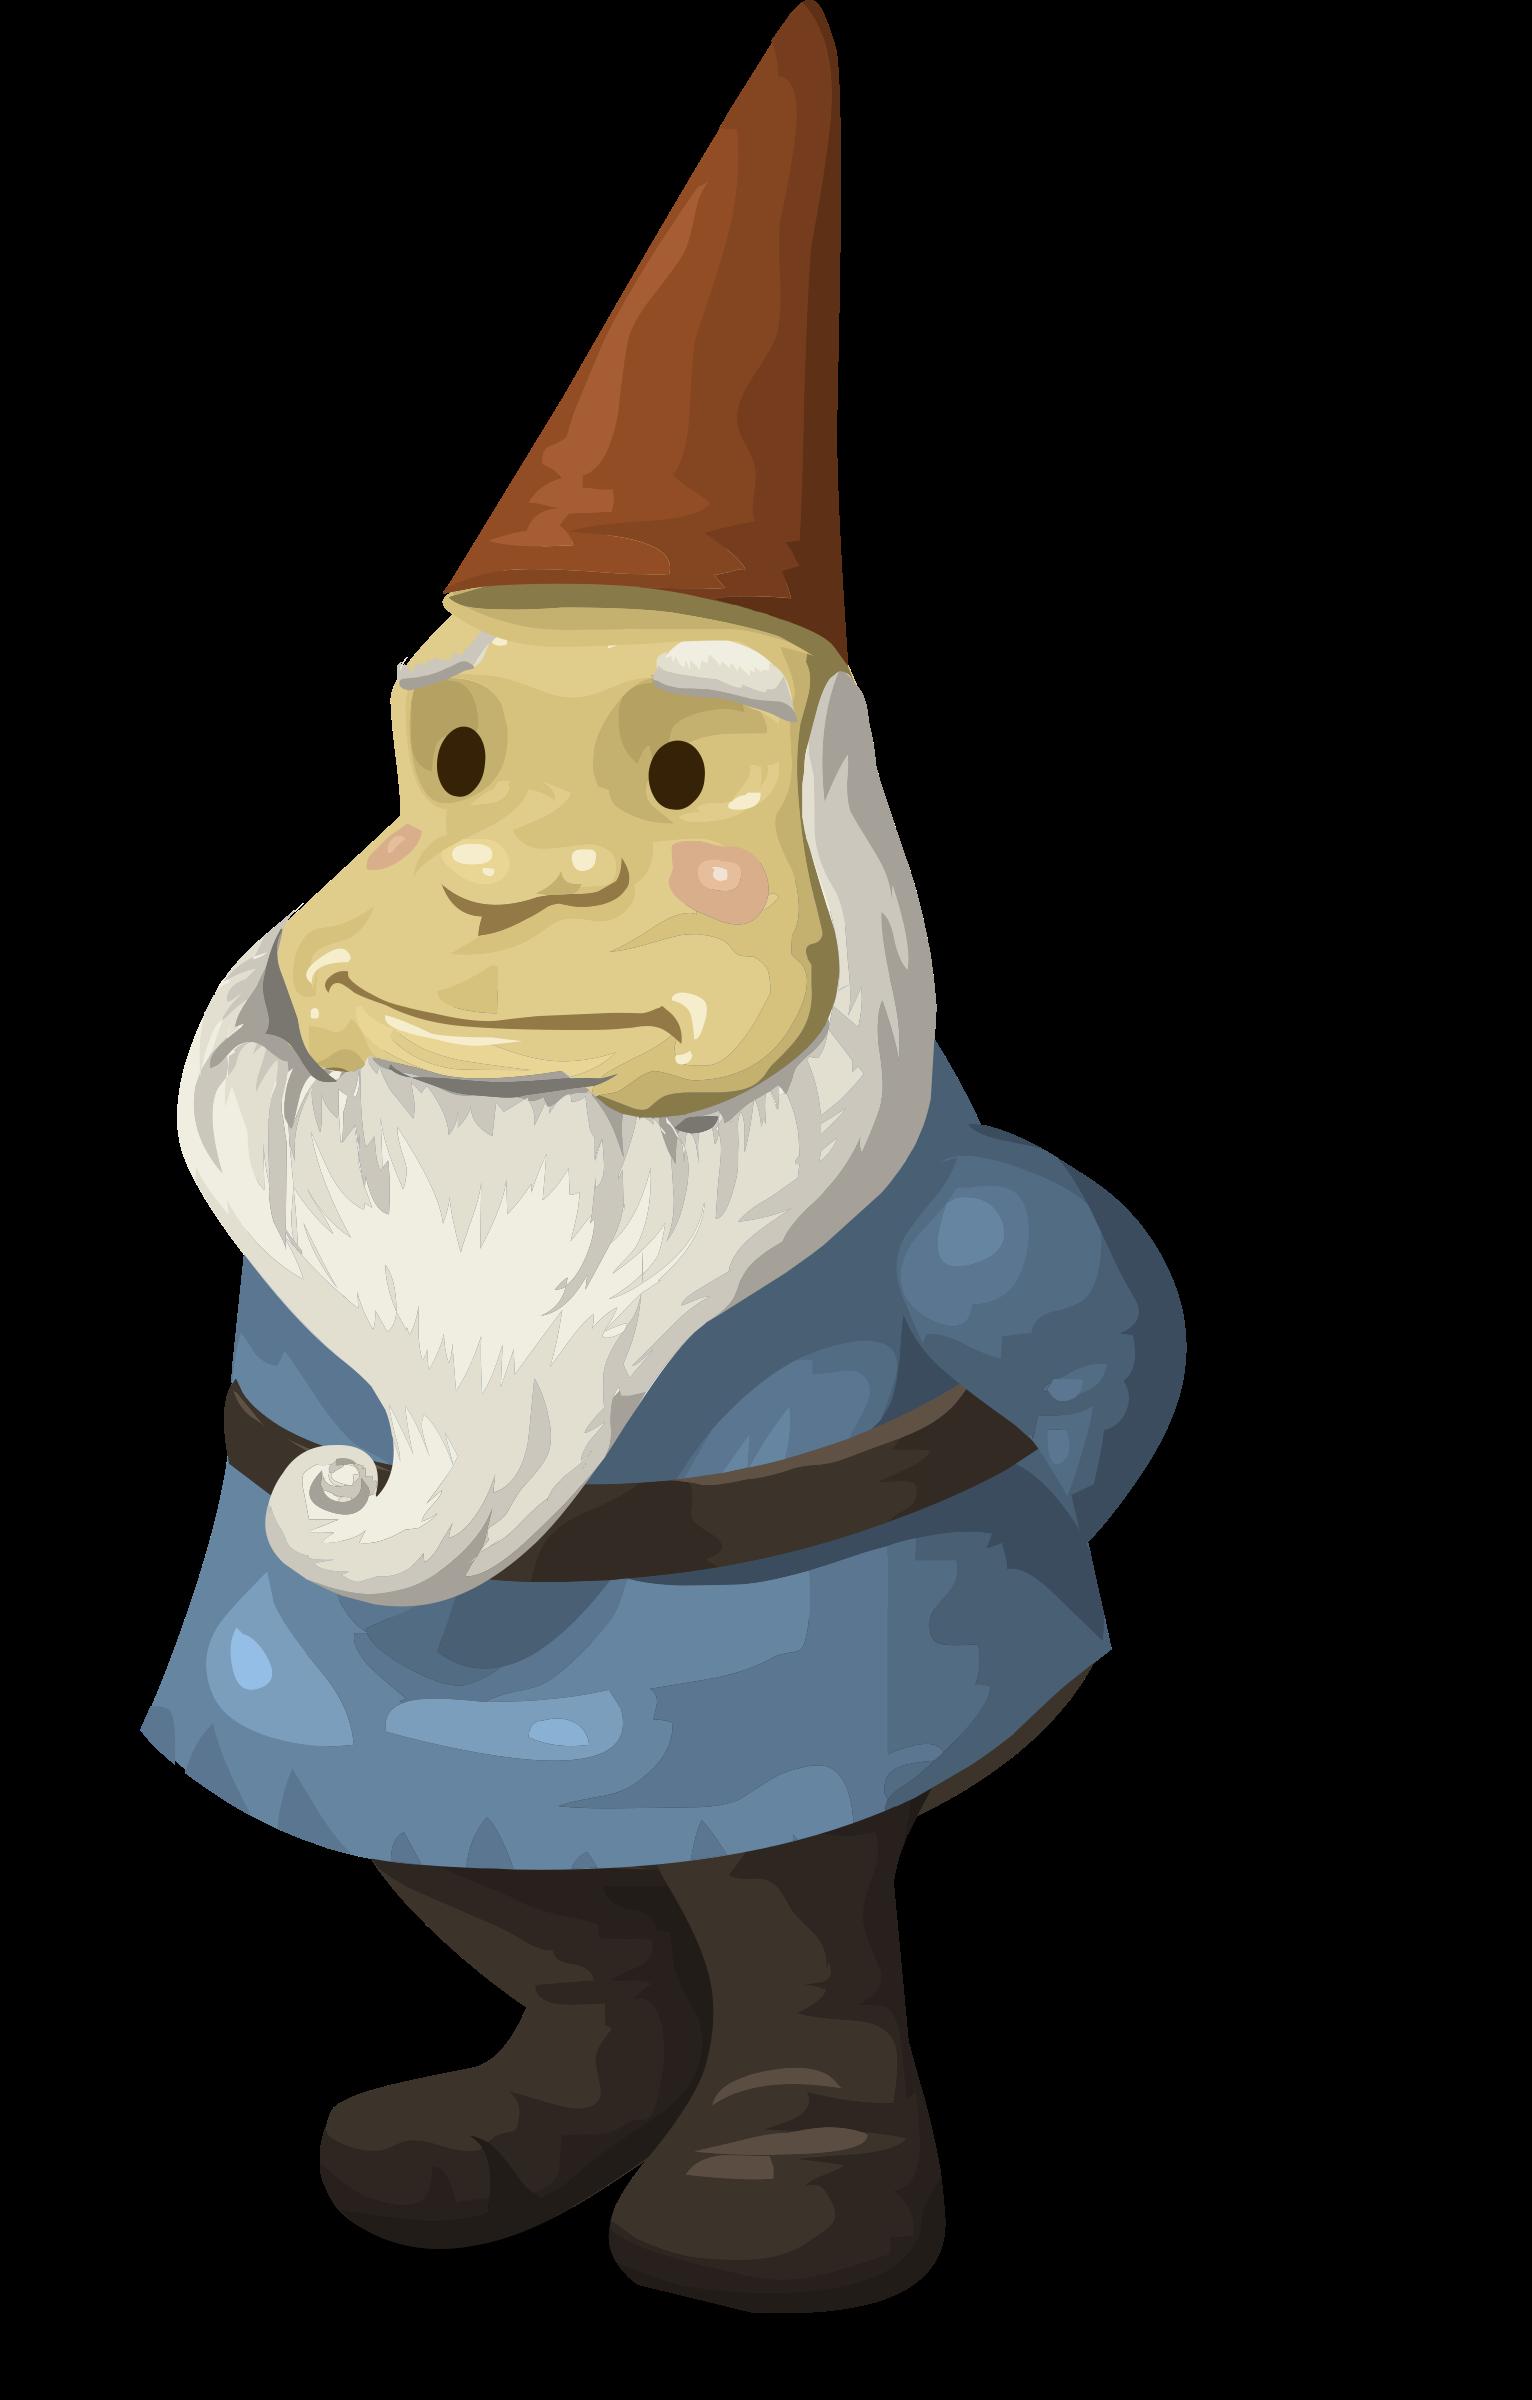 BIG IMAGE (PNG) - Gnome HD PNG